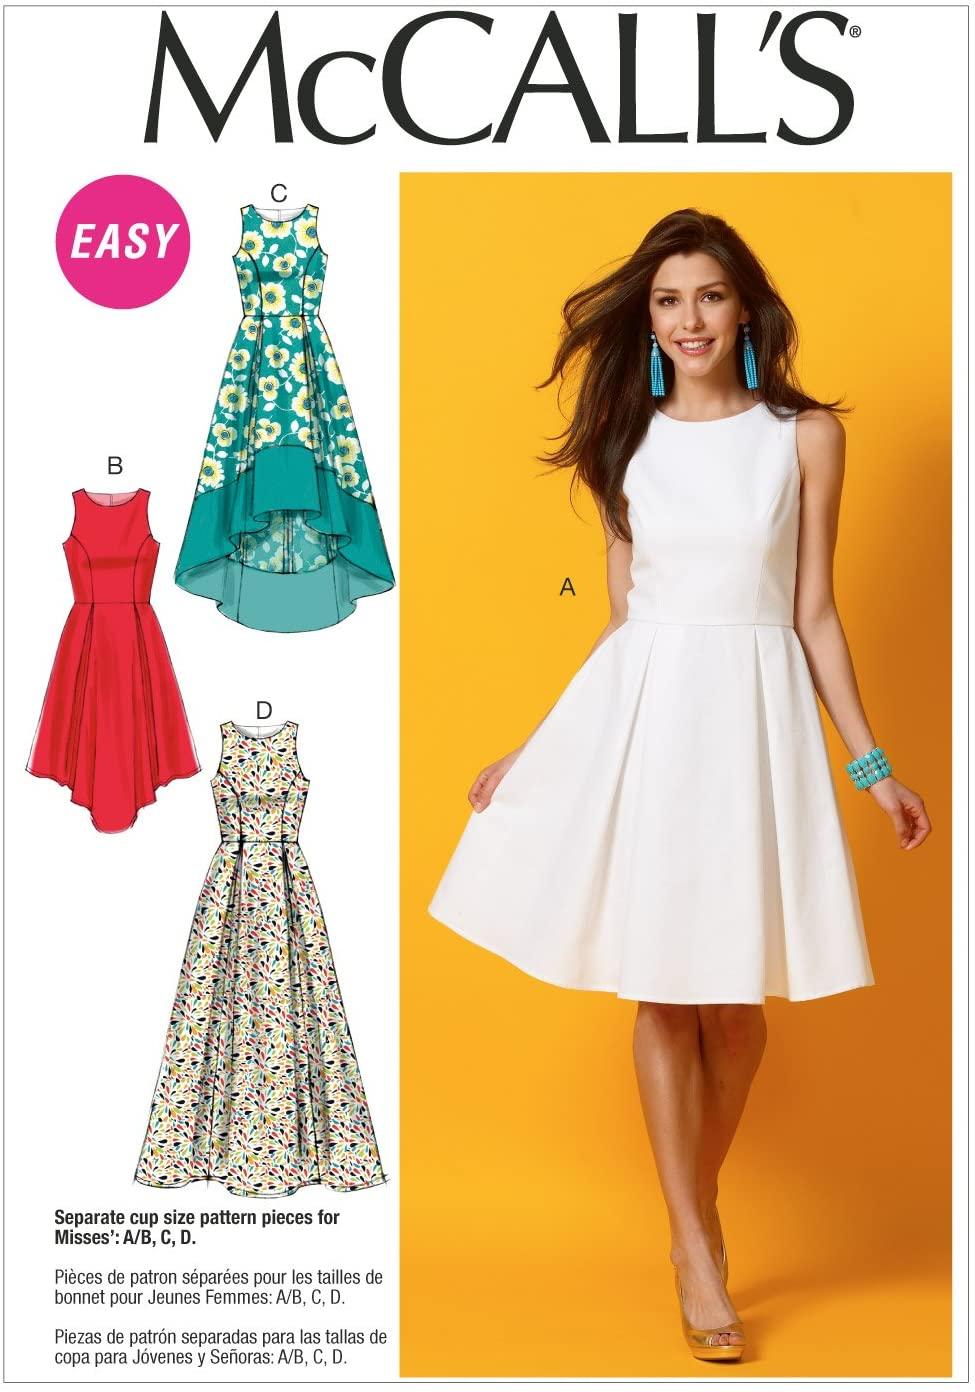 McCall Pattern Company M6953 Misses' Dresses, Size E5